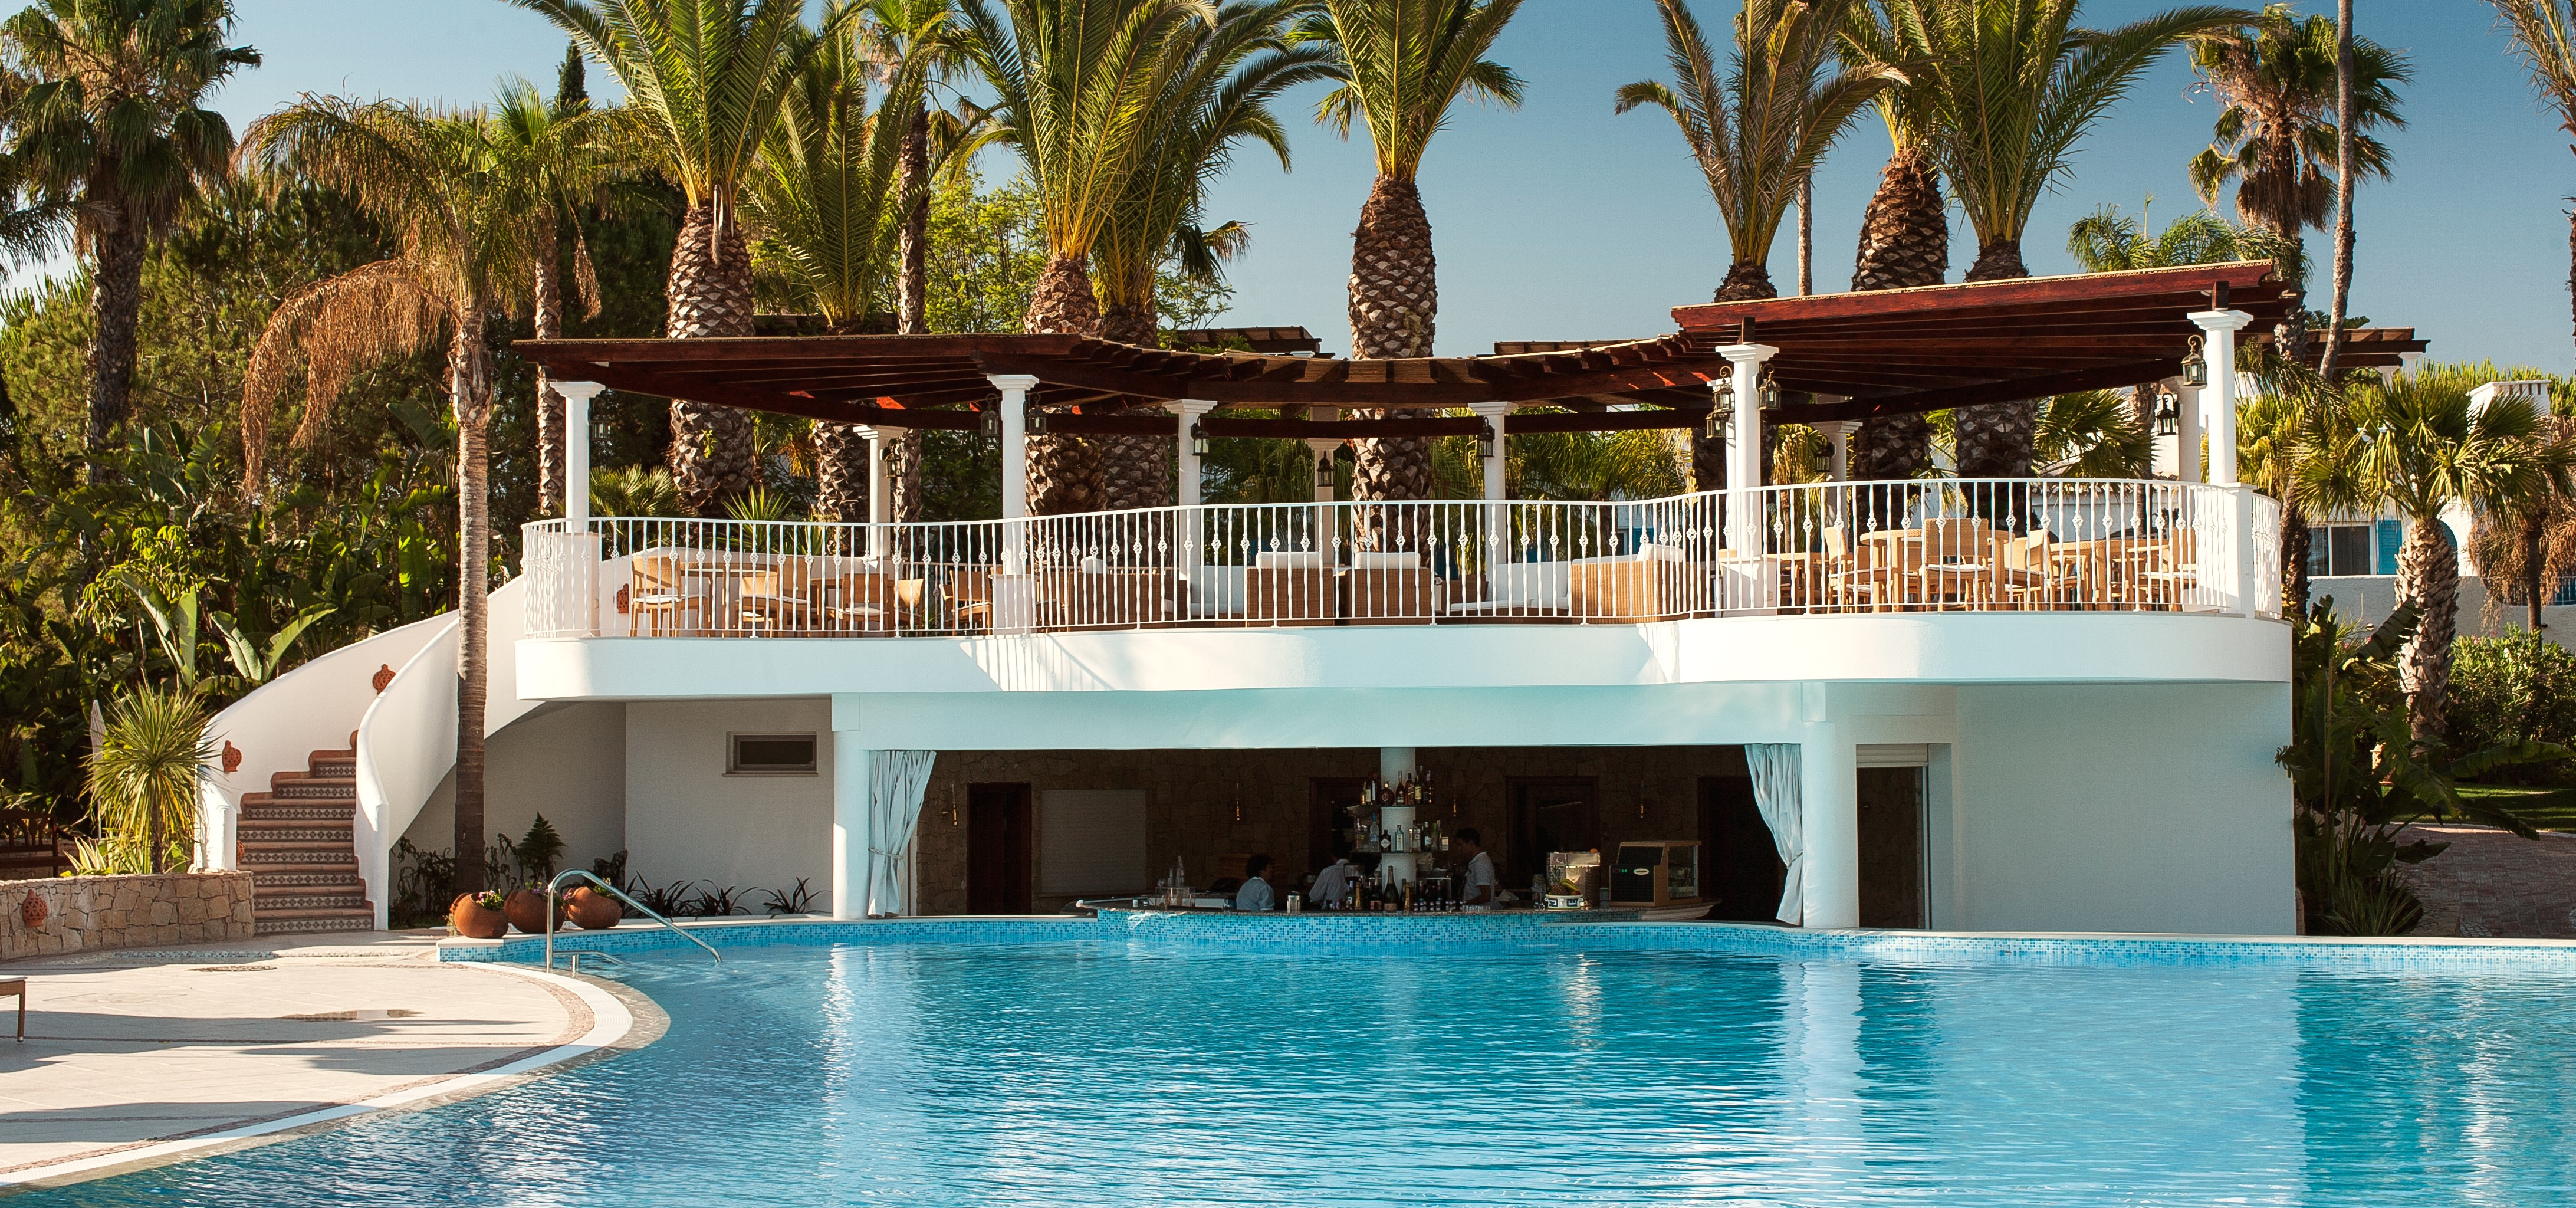 oasis-bar-vila-vita-parc